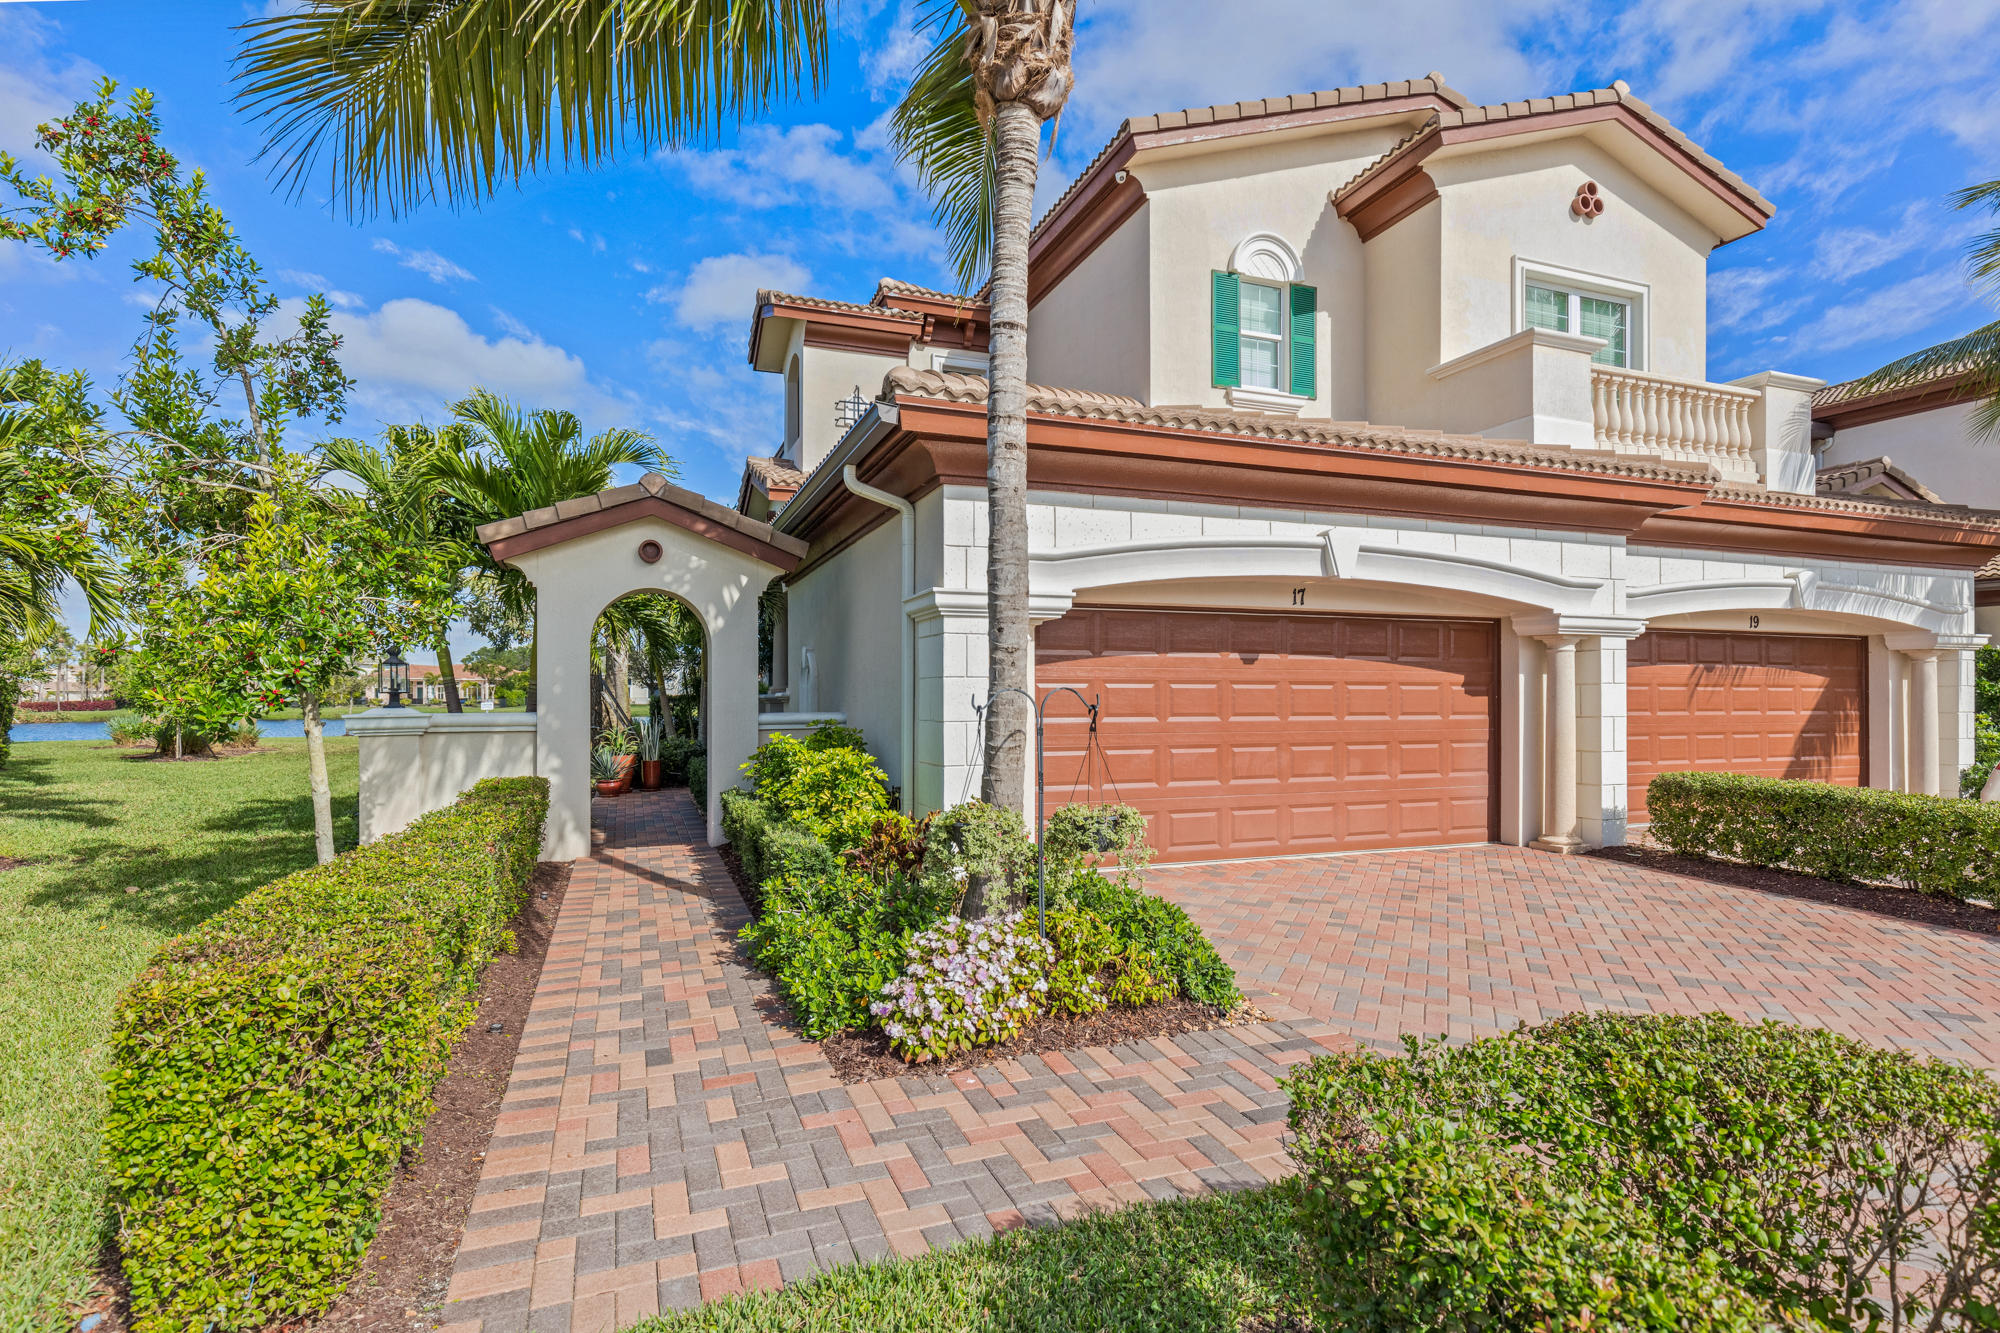 New Home for sale at 107 Tresana Boulevard in Jupiter